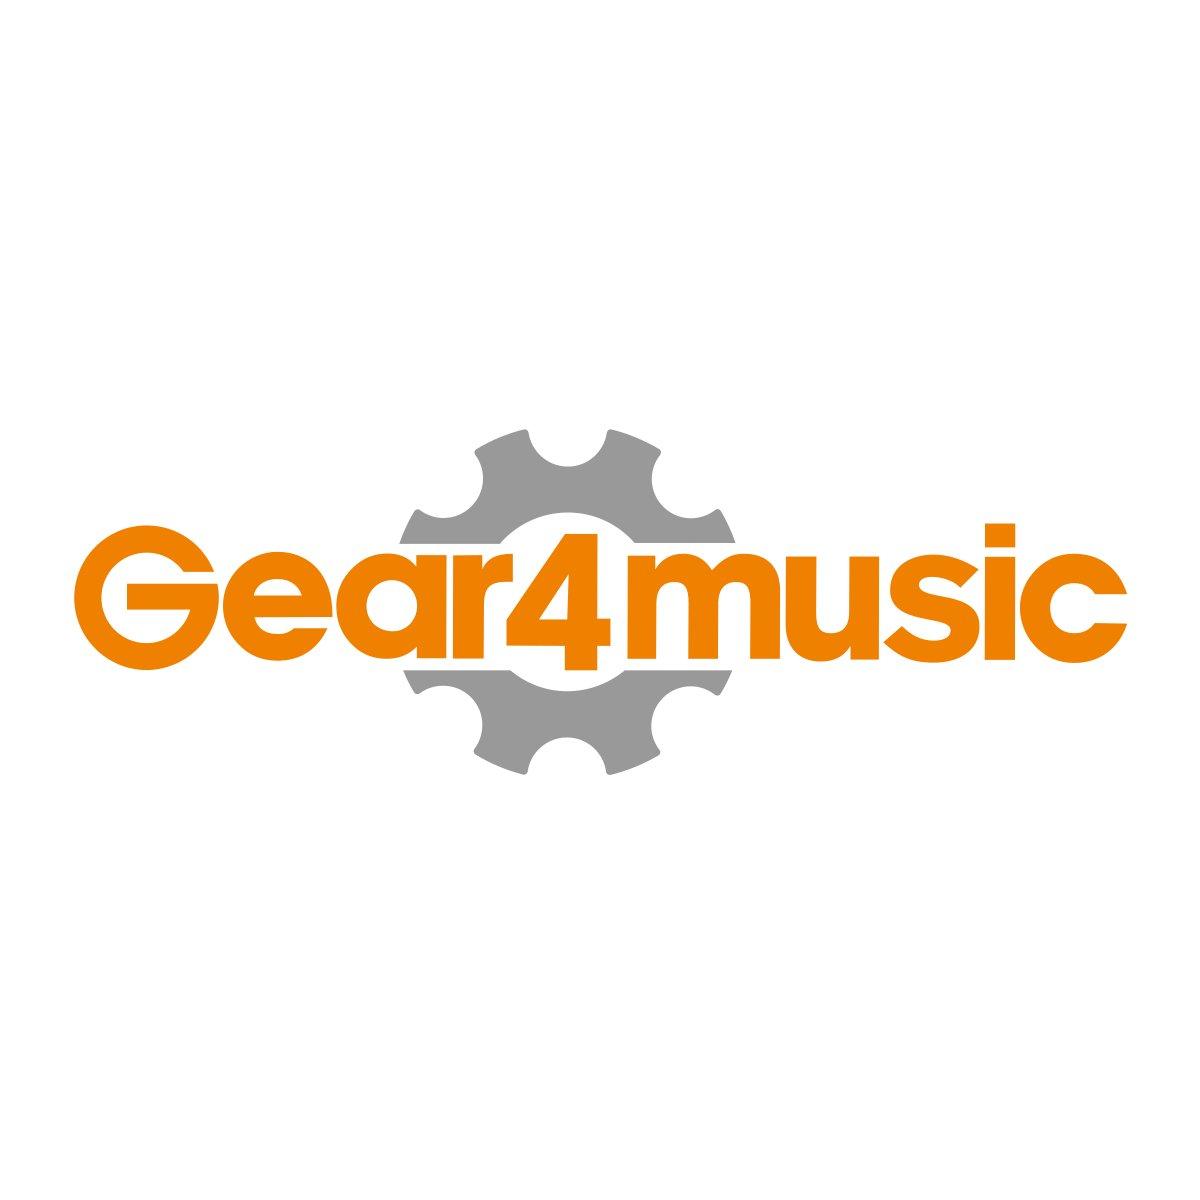 harlem z electric guitar by gear4music black at gear4music. Black Bedroom Furniture Sets. Home Design Ideas